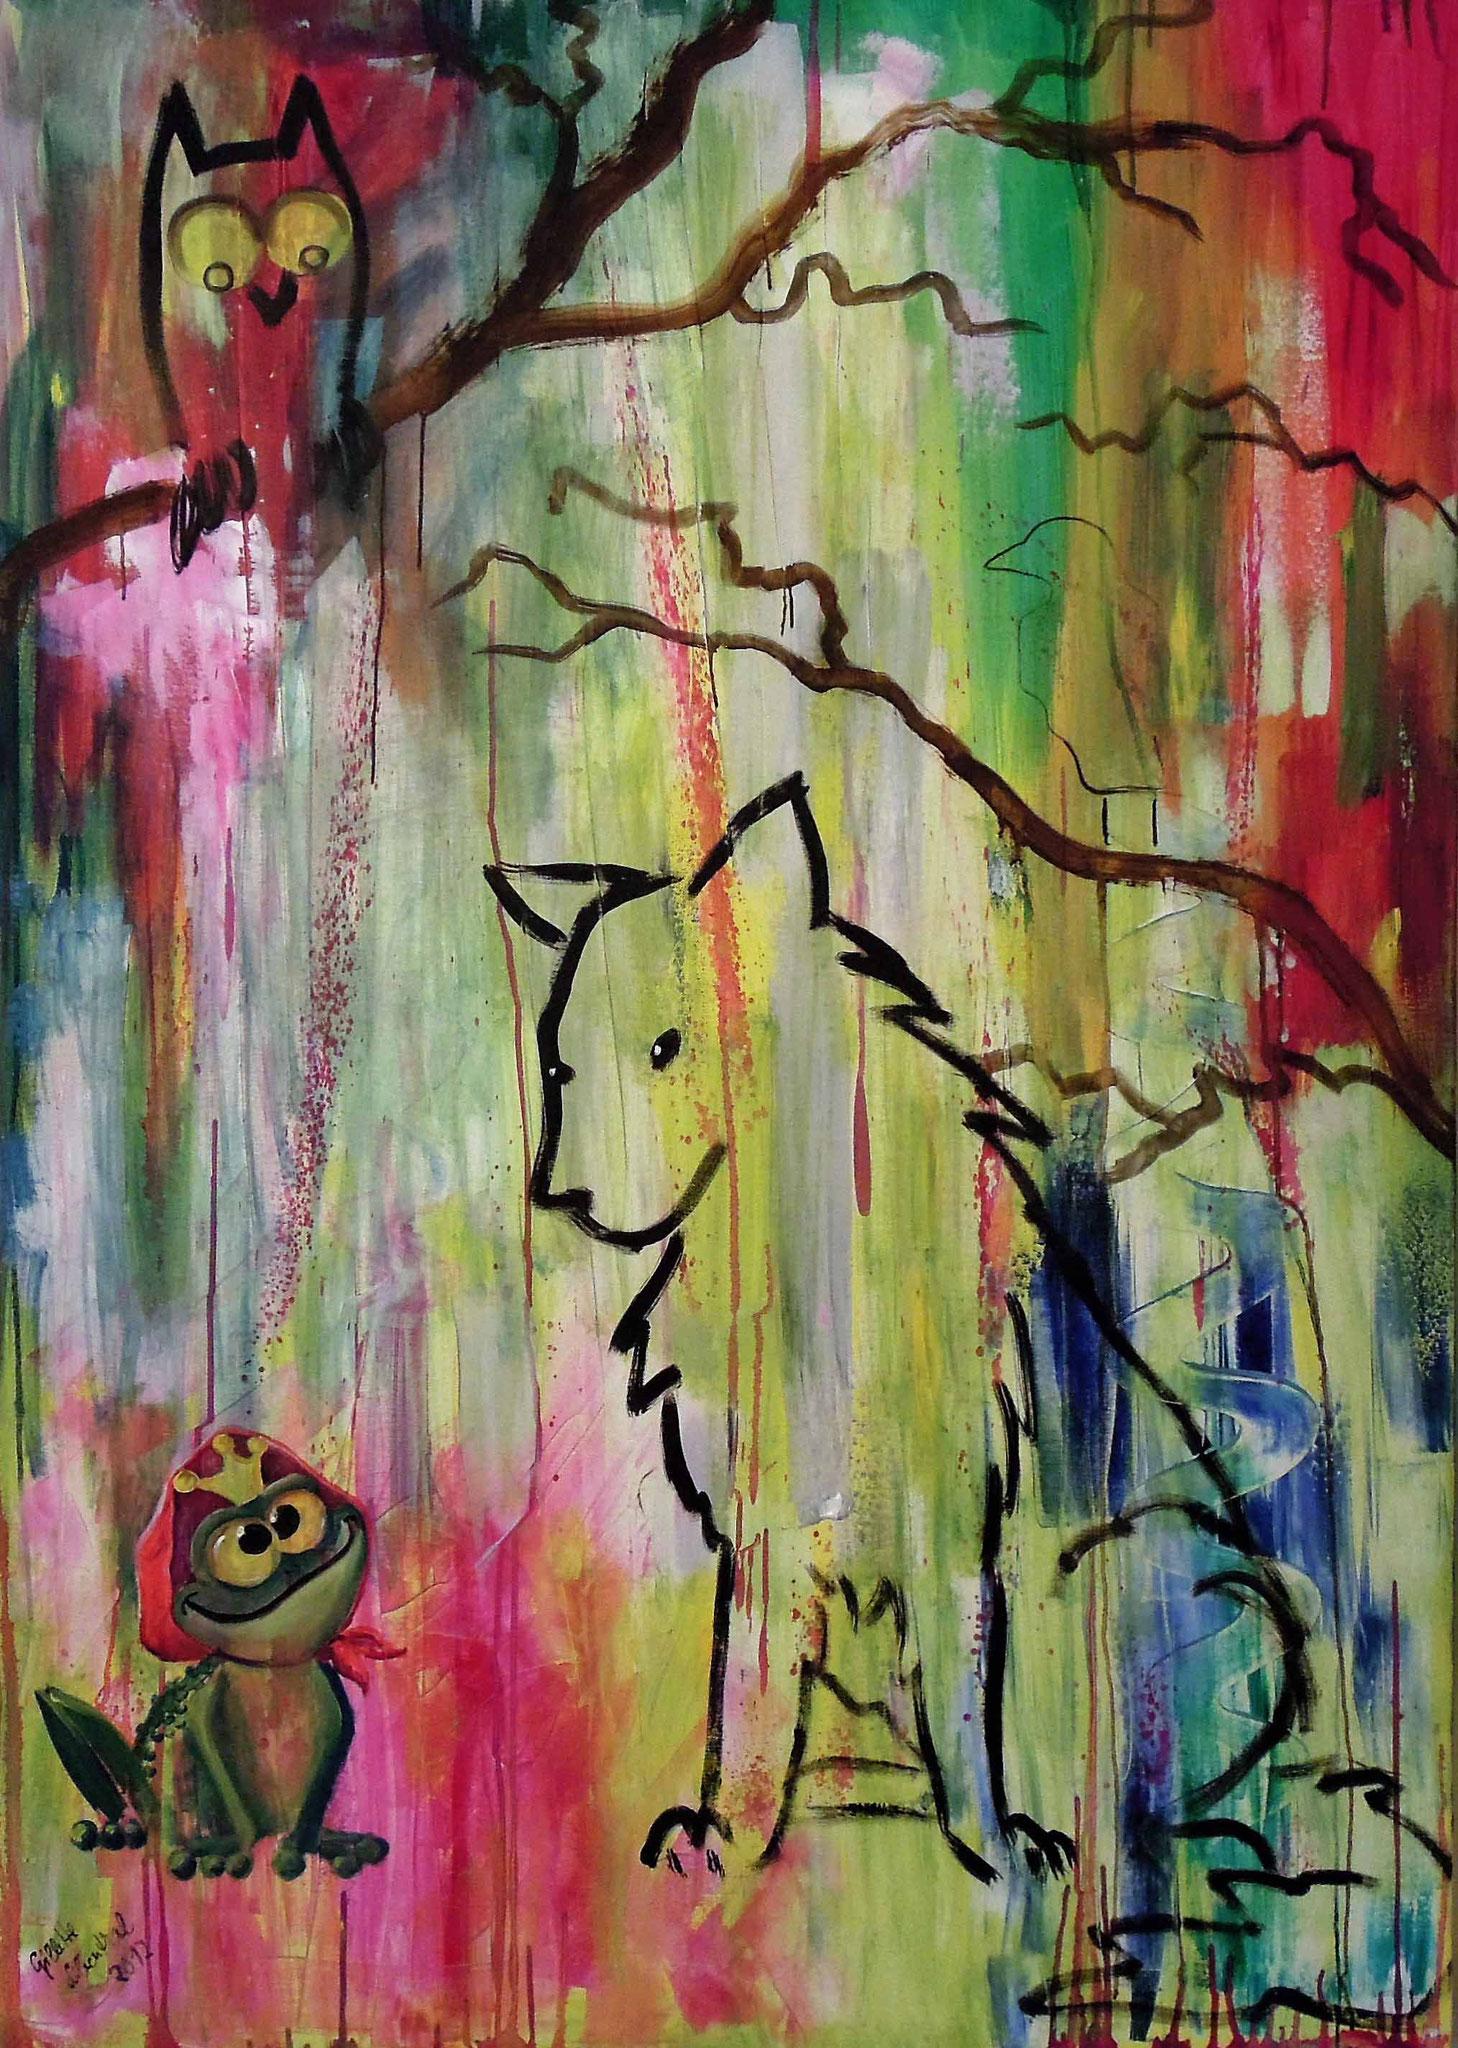 Märchenwald - Öl auf Leinwand 100 x 140 x 10 cm